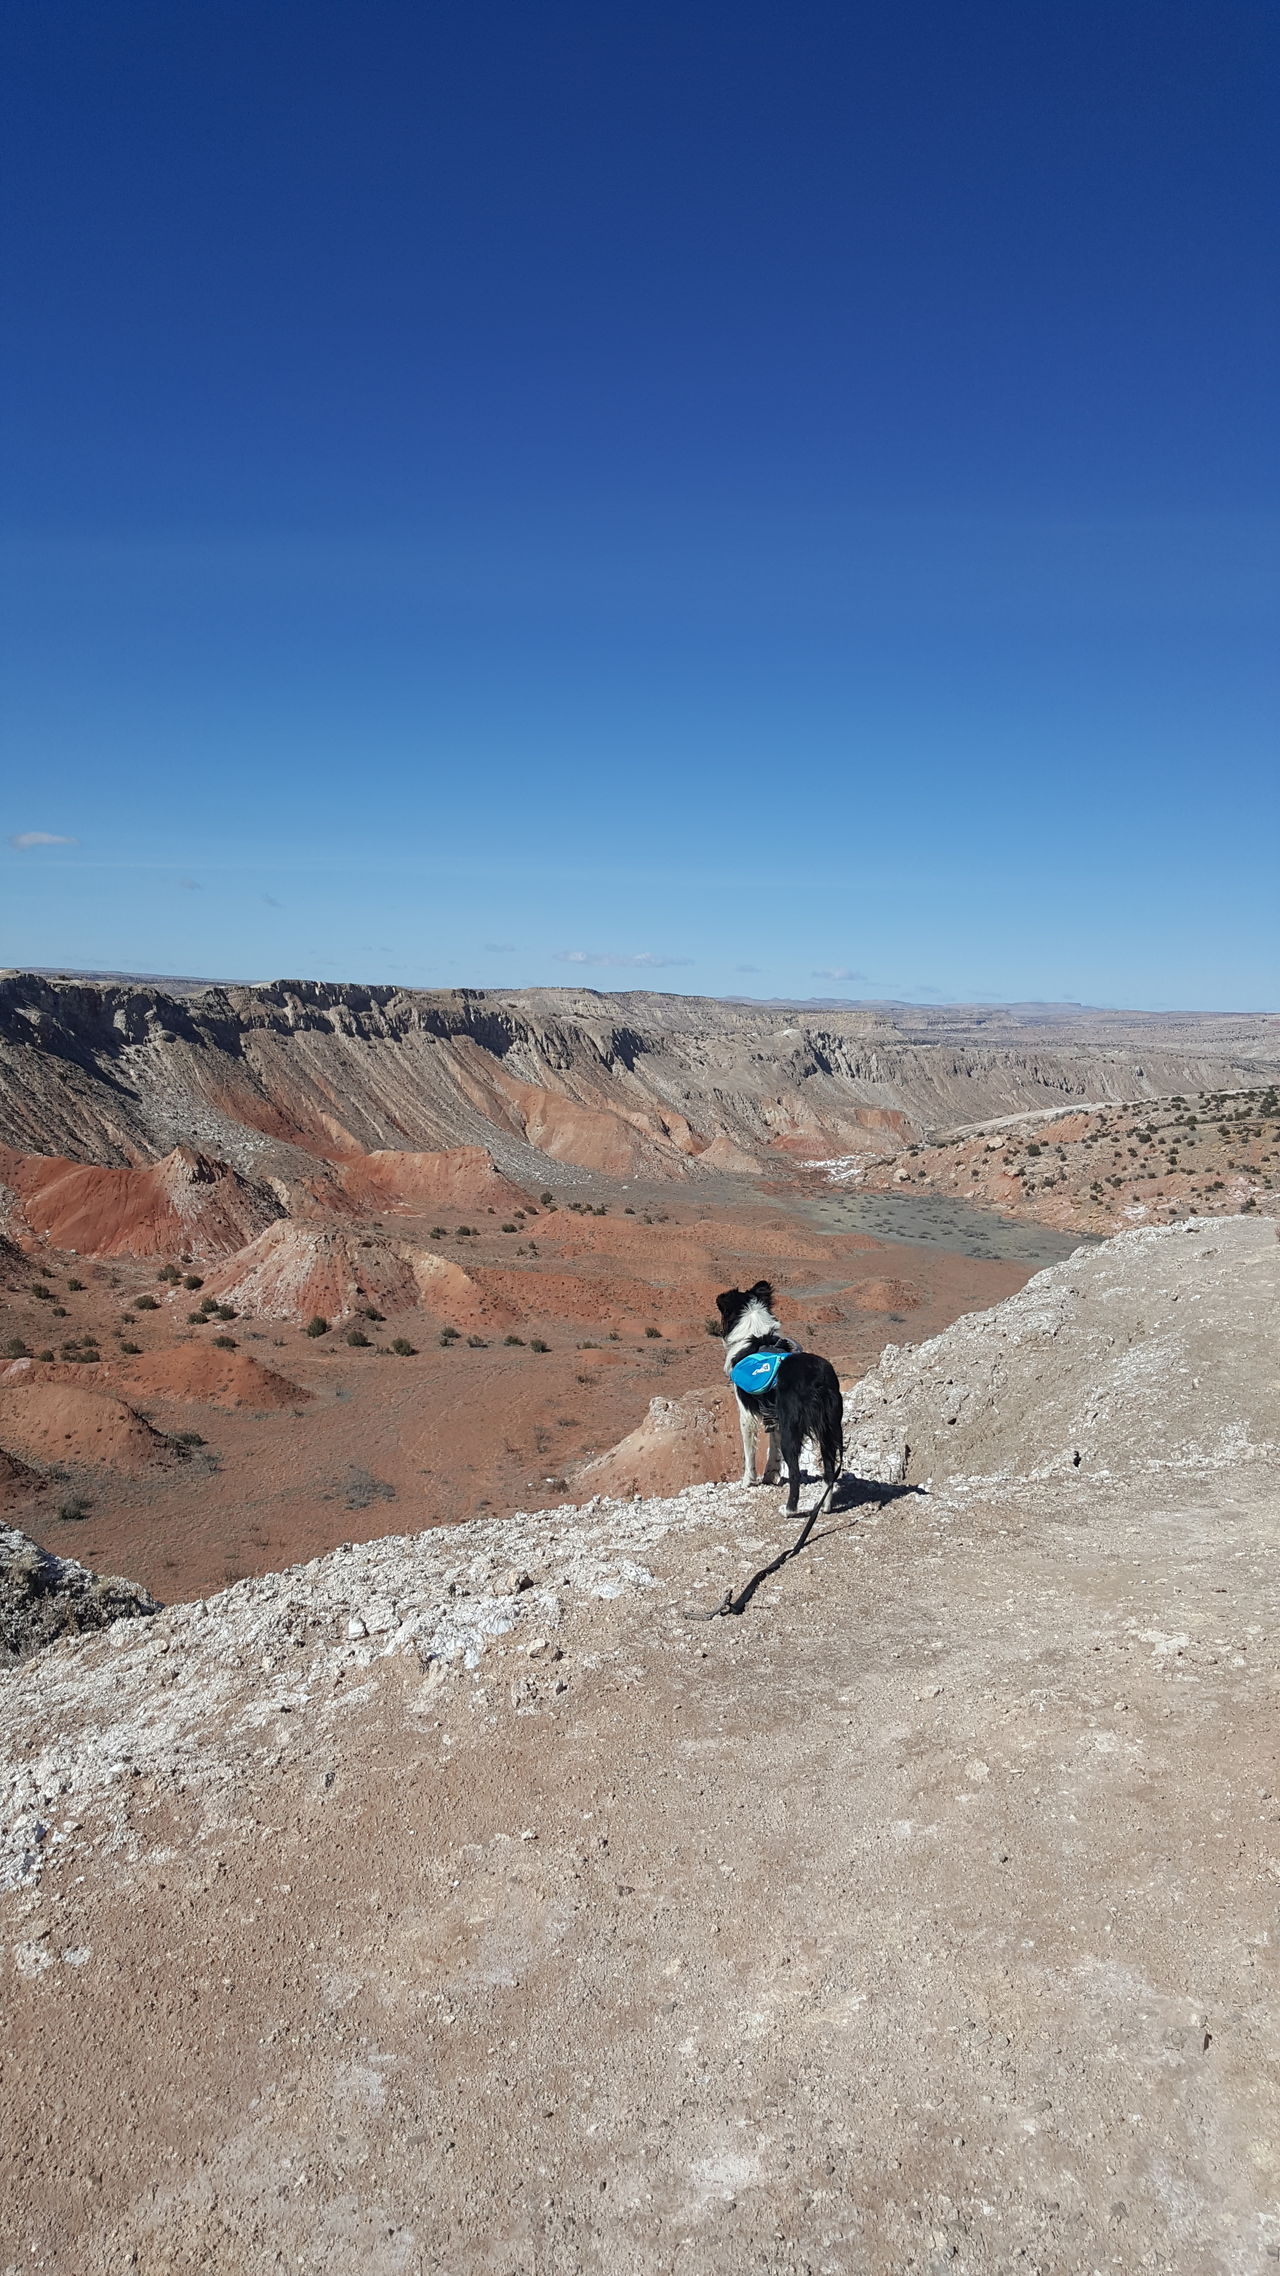 Blue Sky Bike Trail Outdoors Doggy Backpack Doggy Hiking💙 Desert Landscape Beauty In Nature White Mesa Jemez Pueblo Desert Sky Landscape